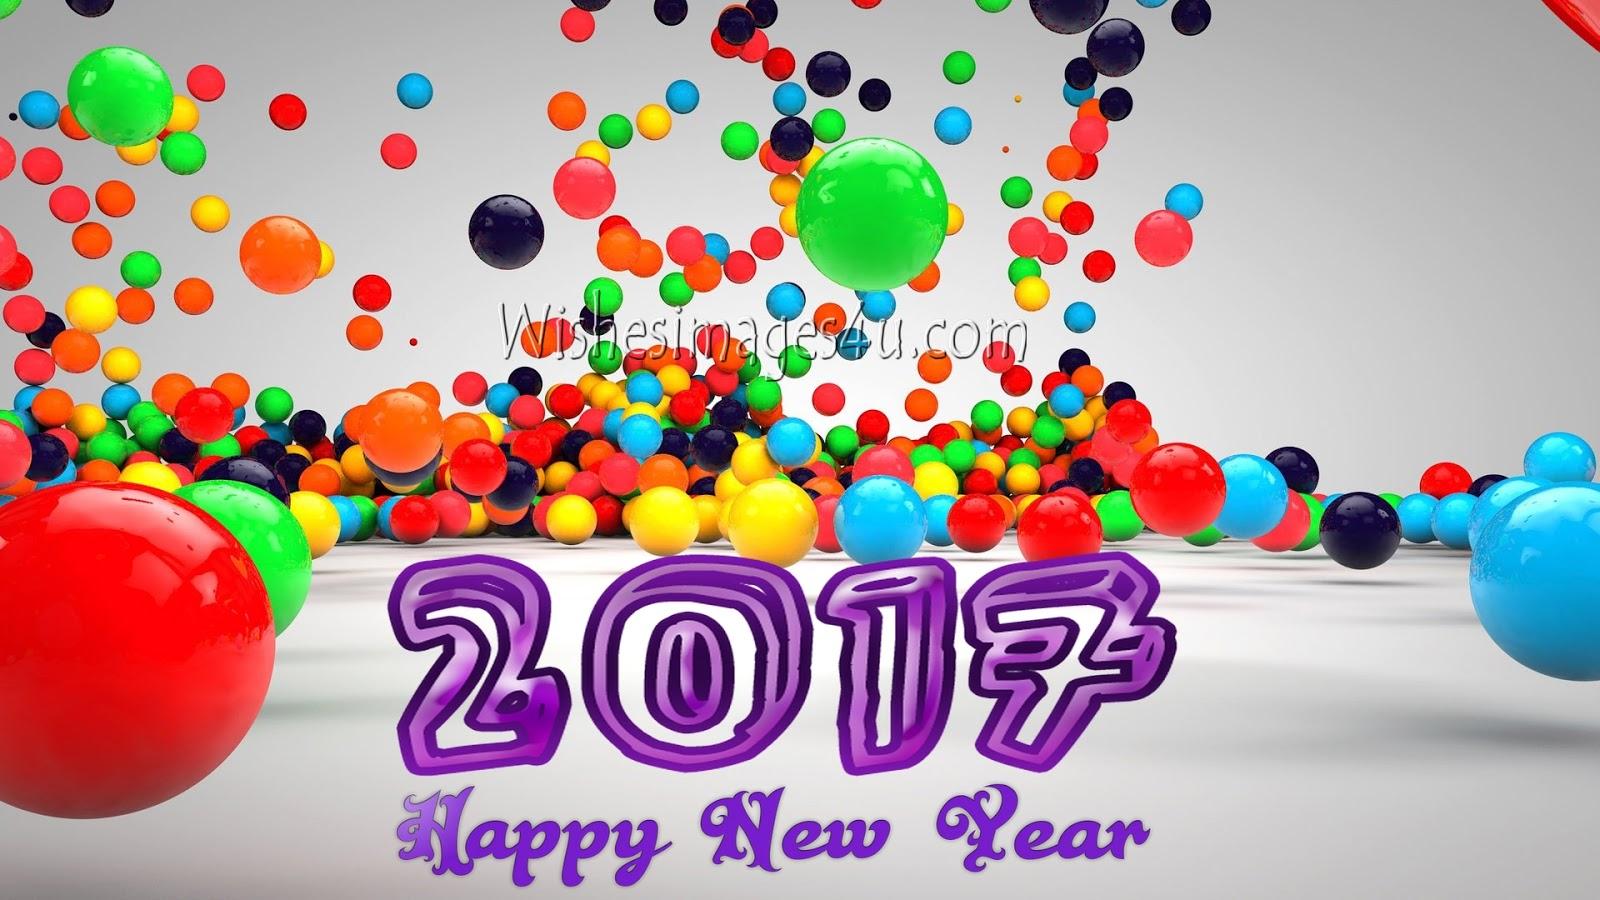 3d happy new year 2017 wallpaper